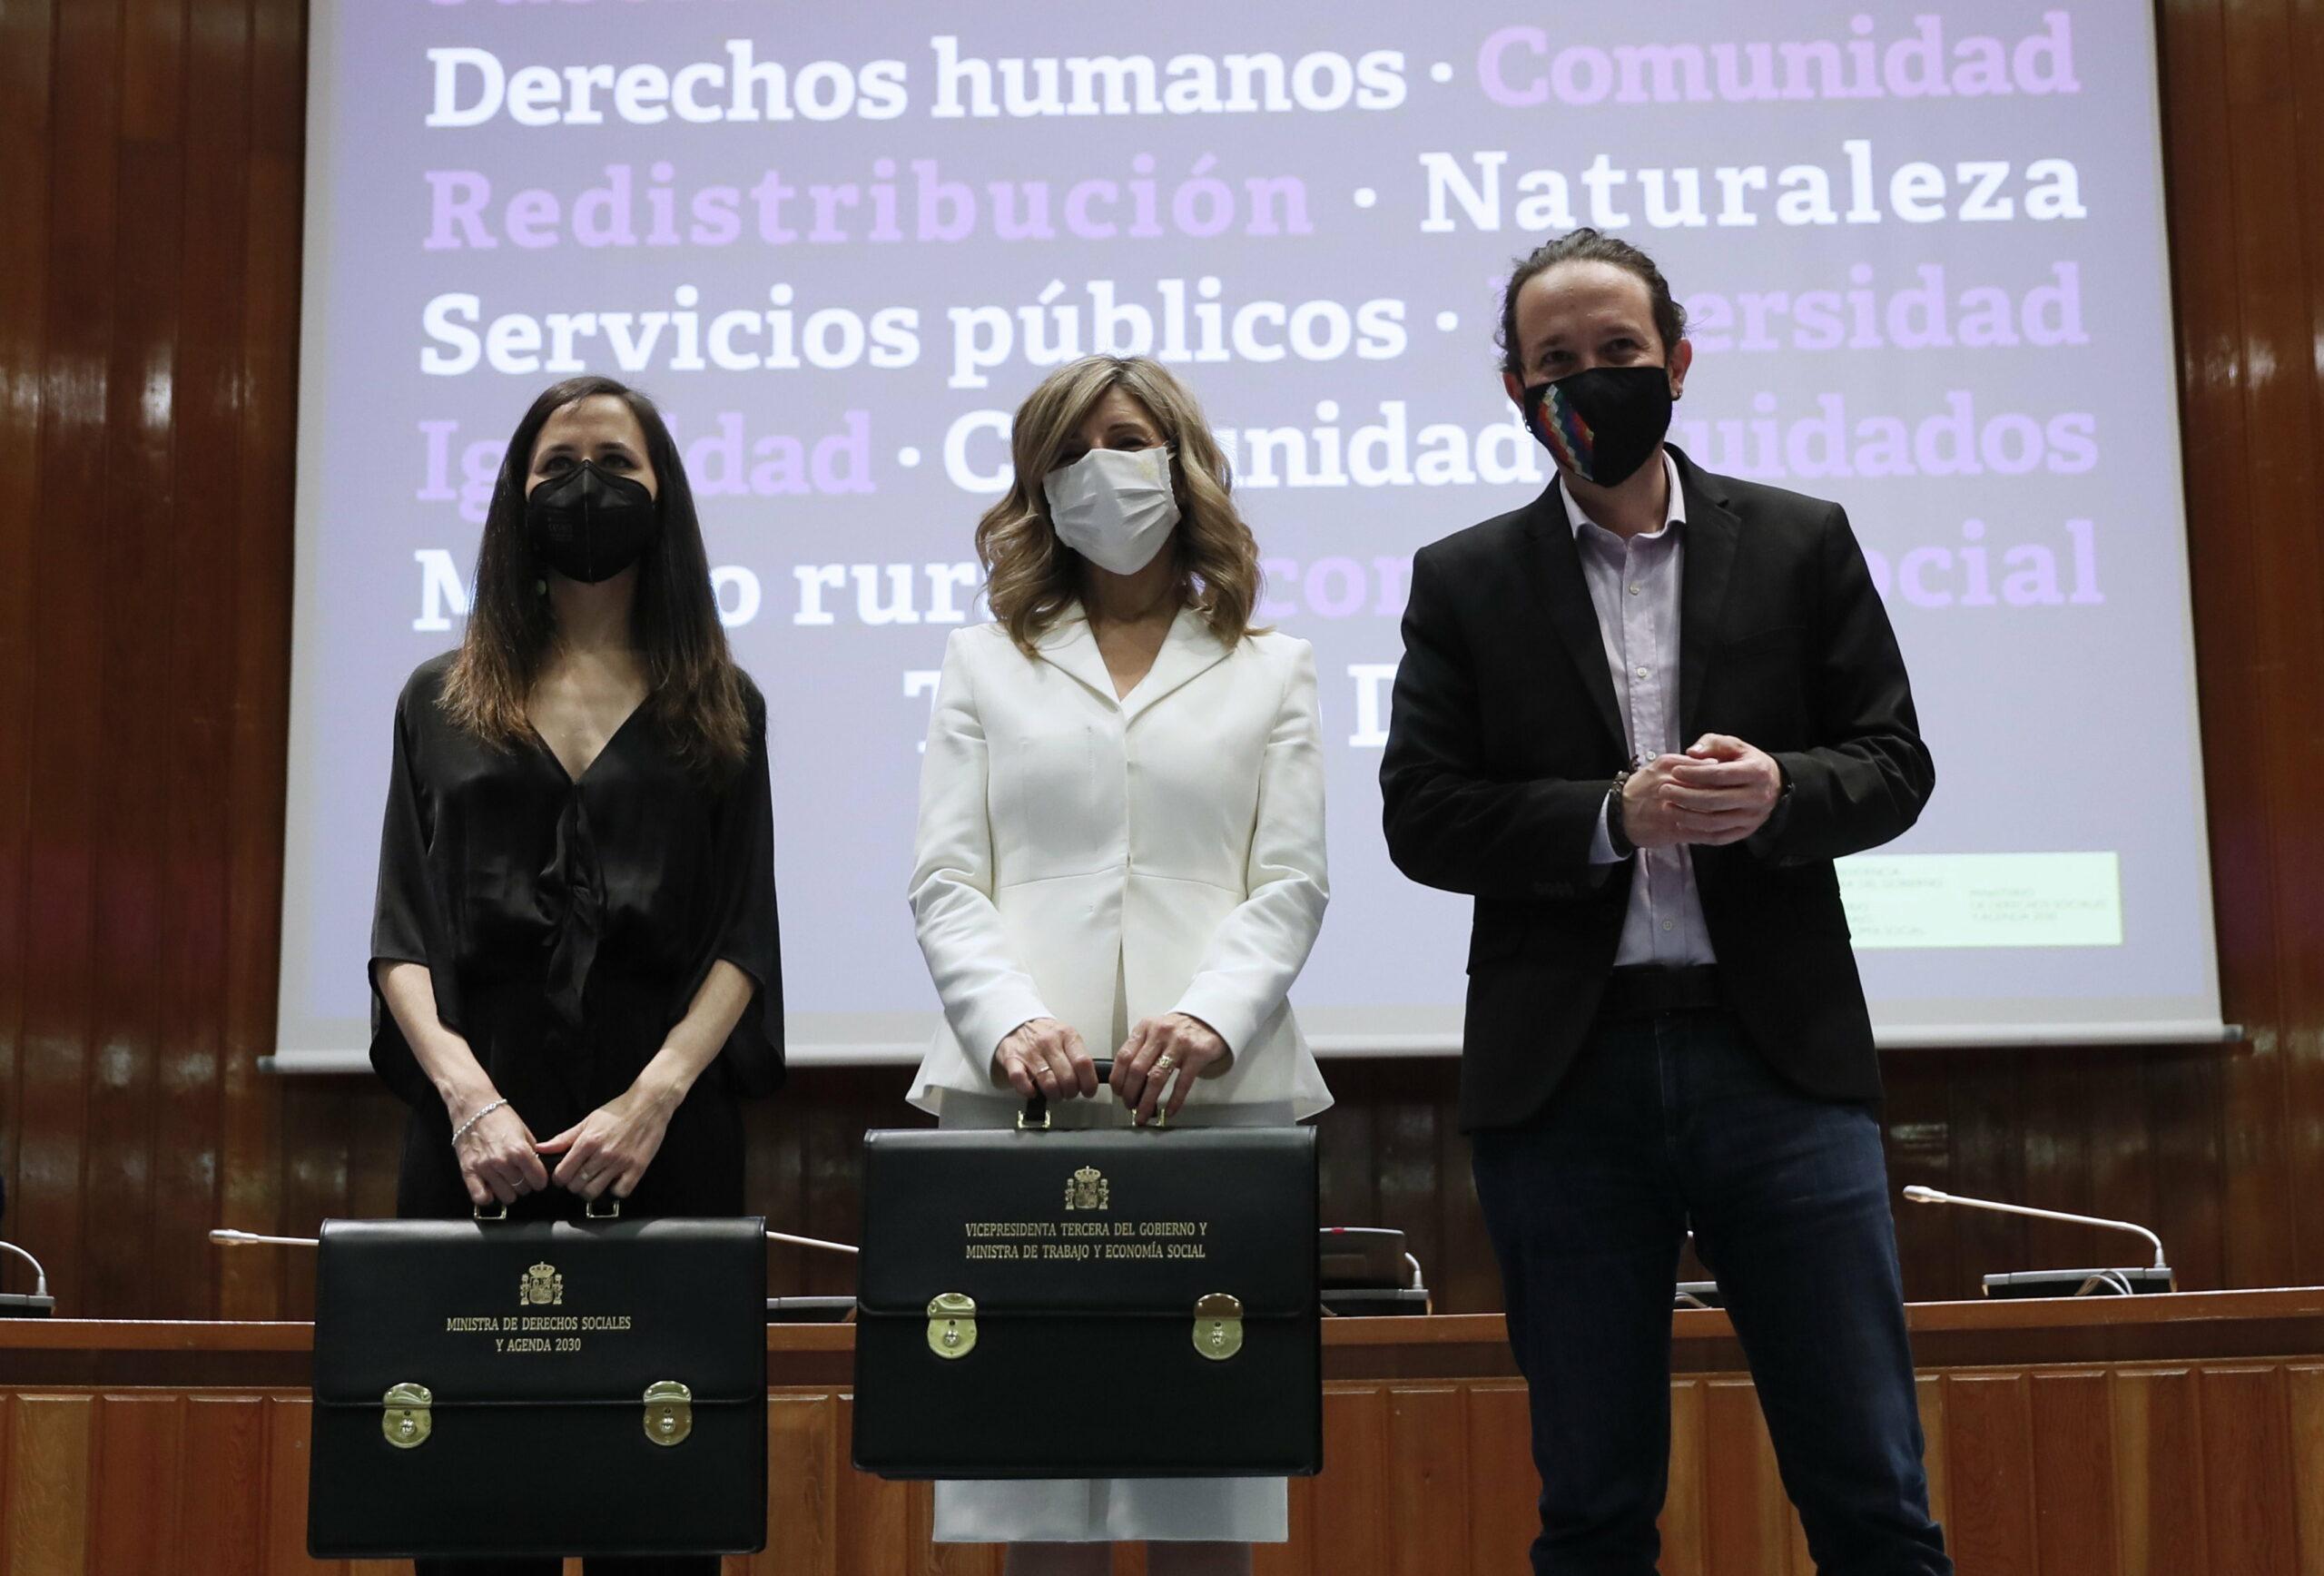 L'exvicepresident Pablo Iglesias amb la vicepresidenta tercera, Yolanda Díaz, i la ministra de Drets Socials, Ione Belarra | ACN